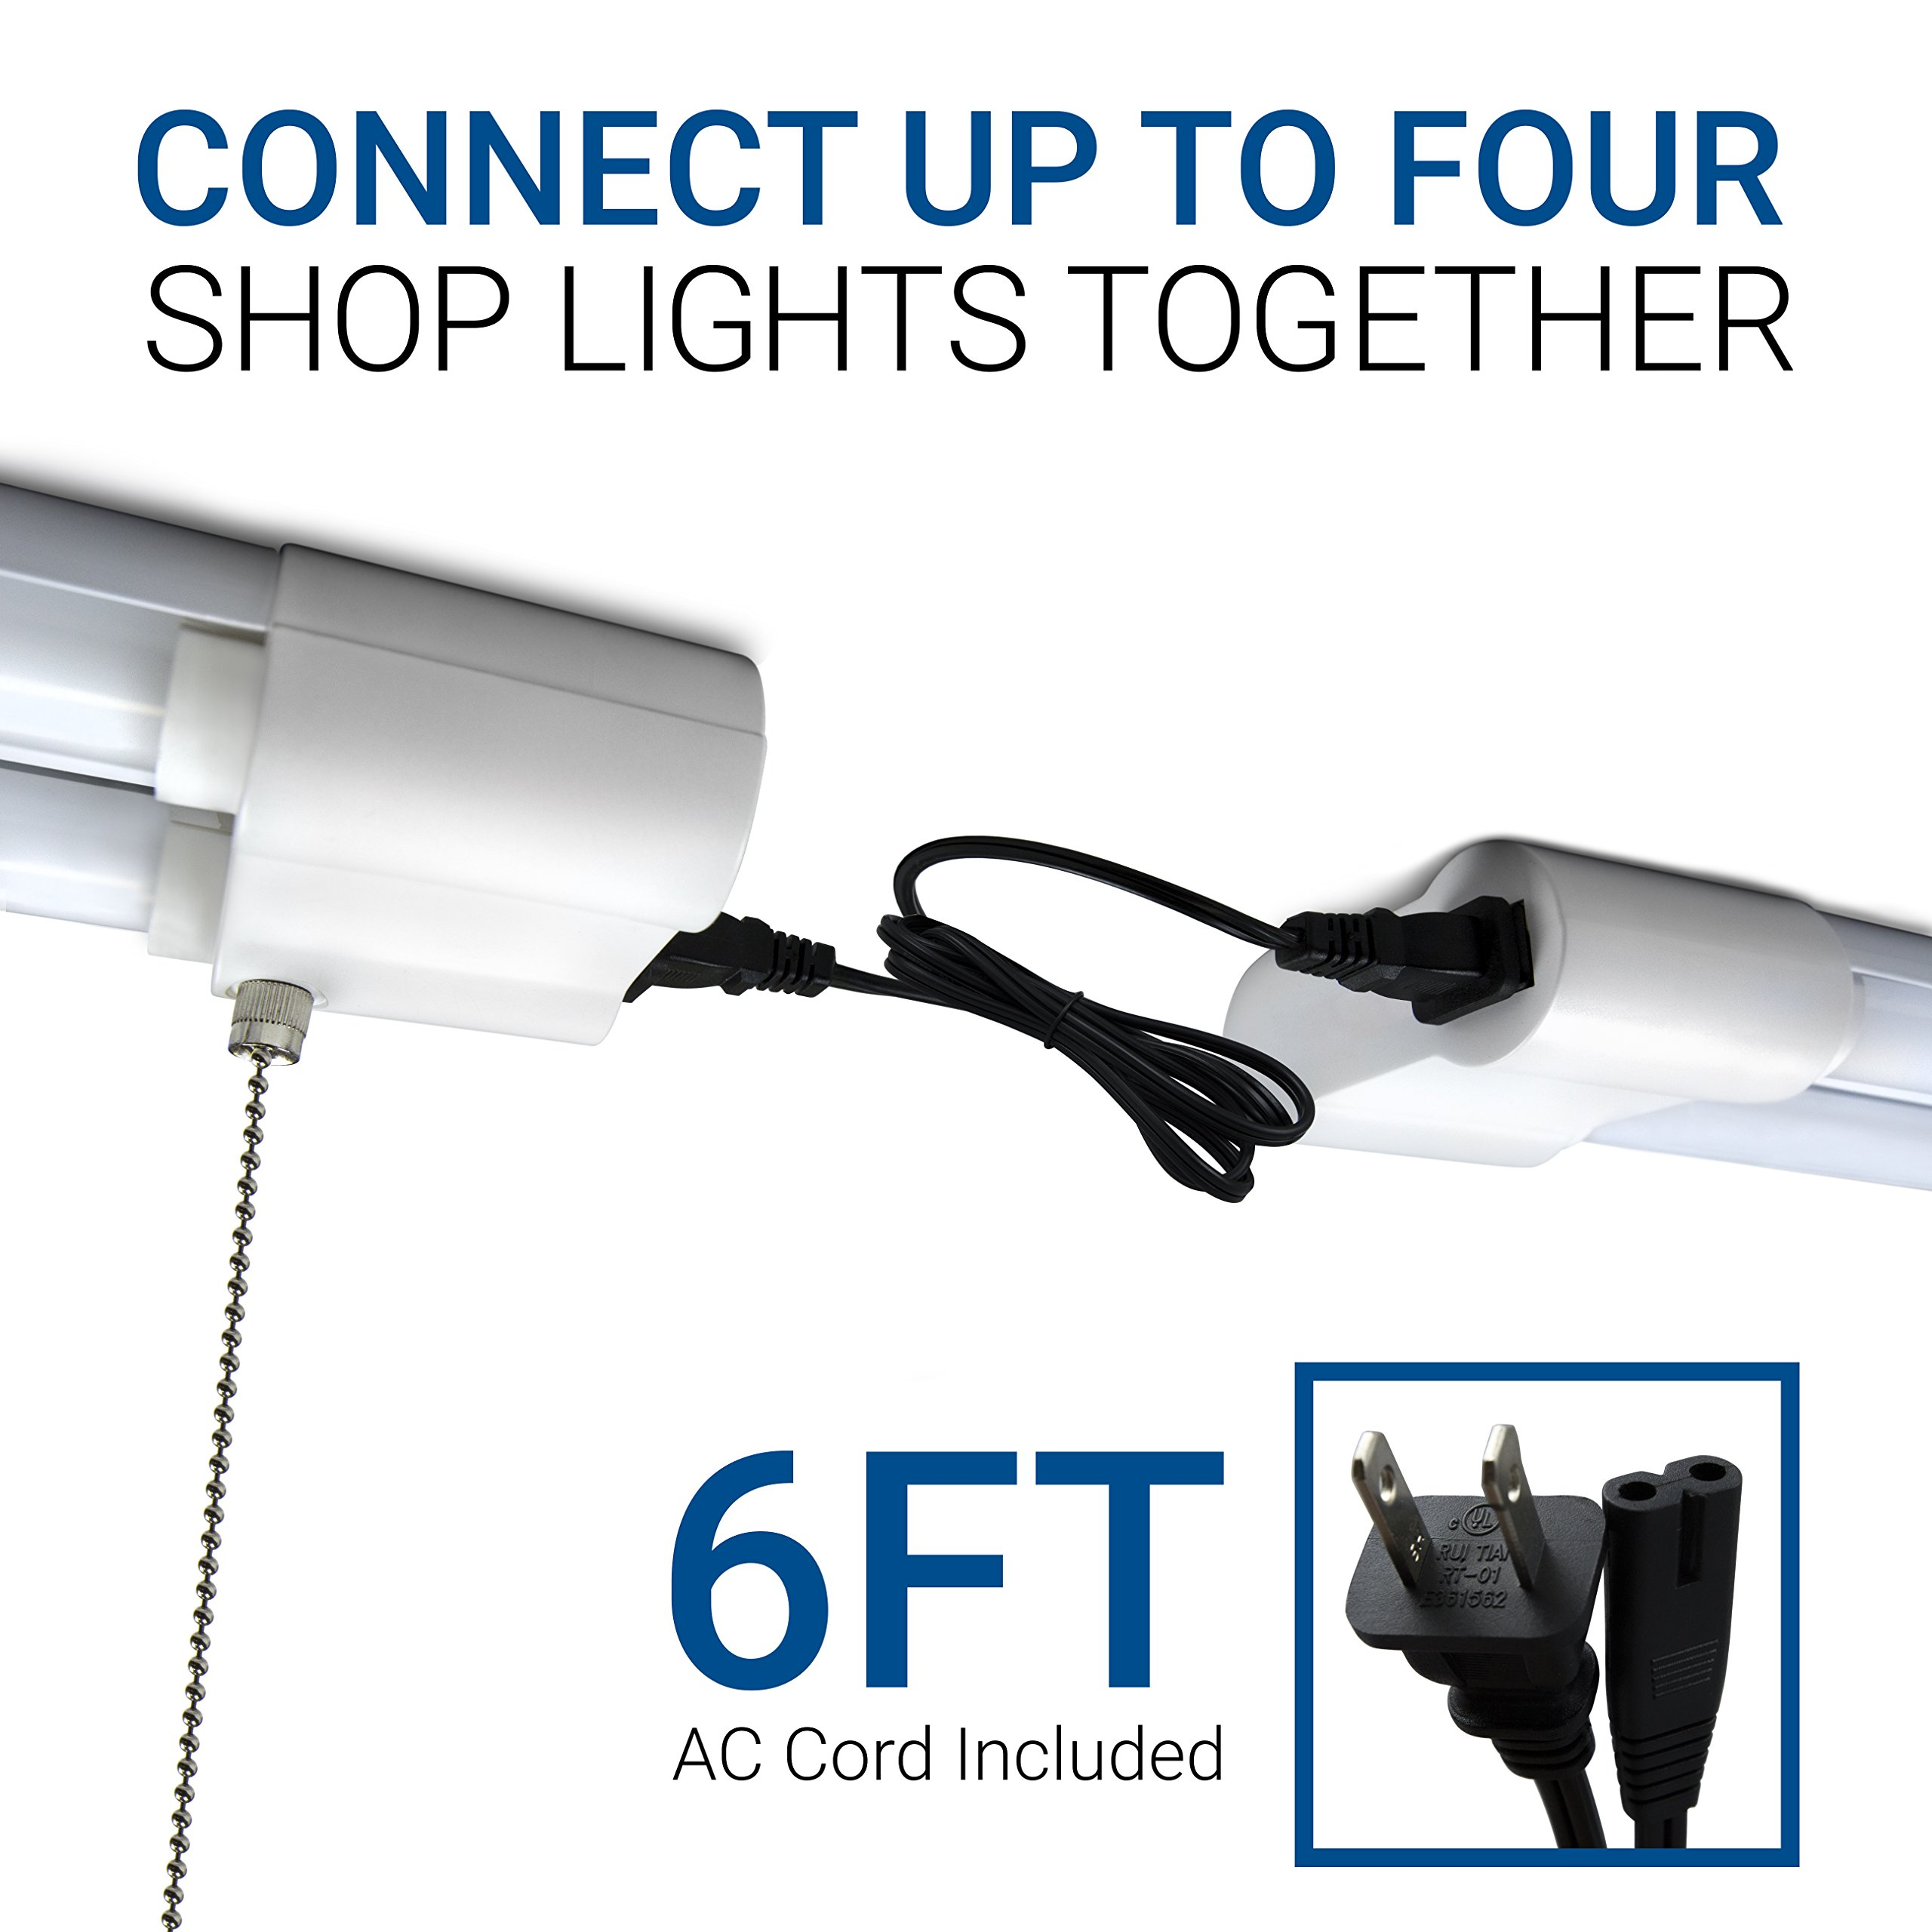 Hyperikon LED Utility Shop Light, 4FT Linkable Double